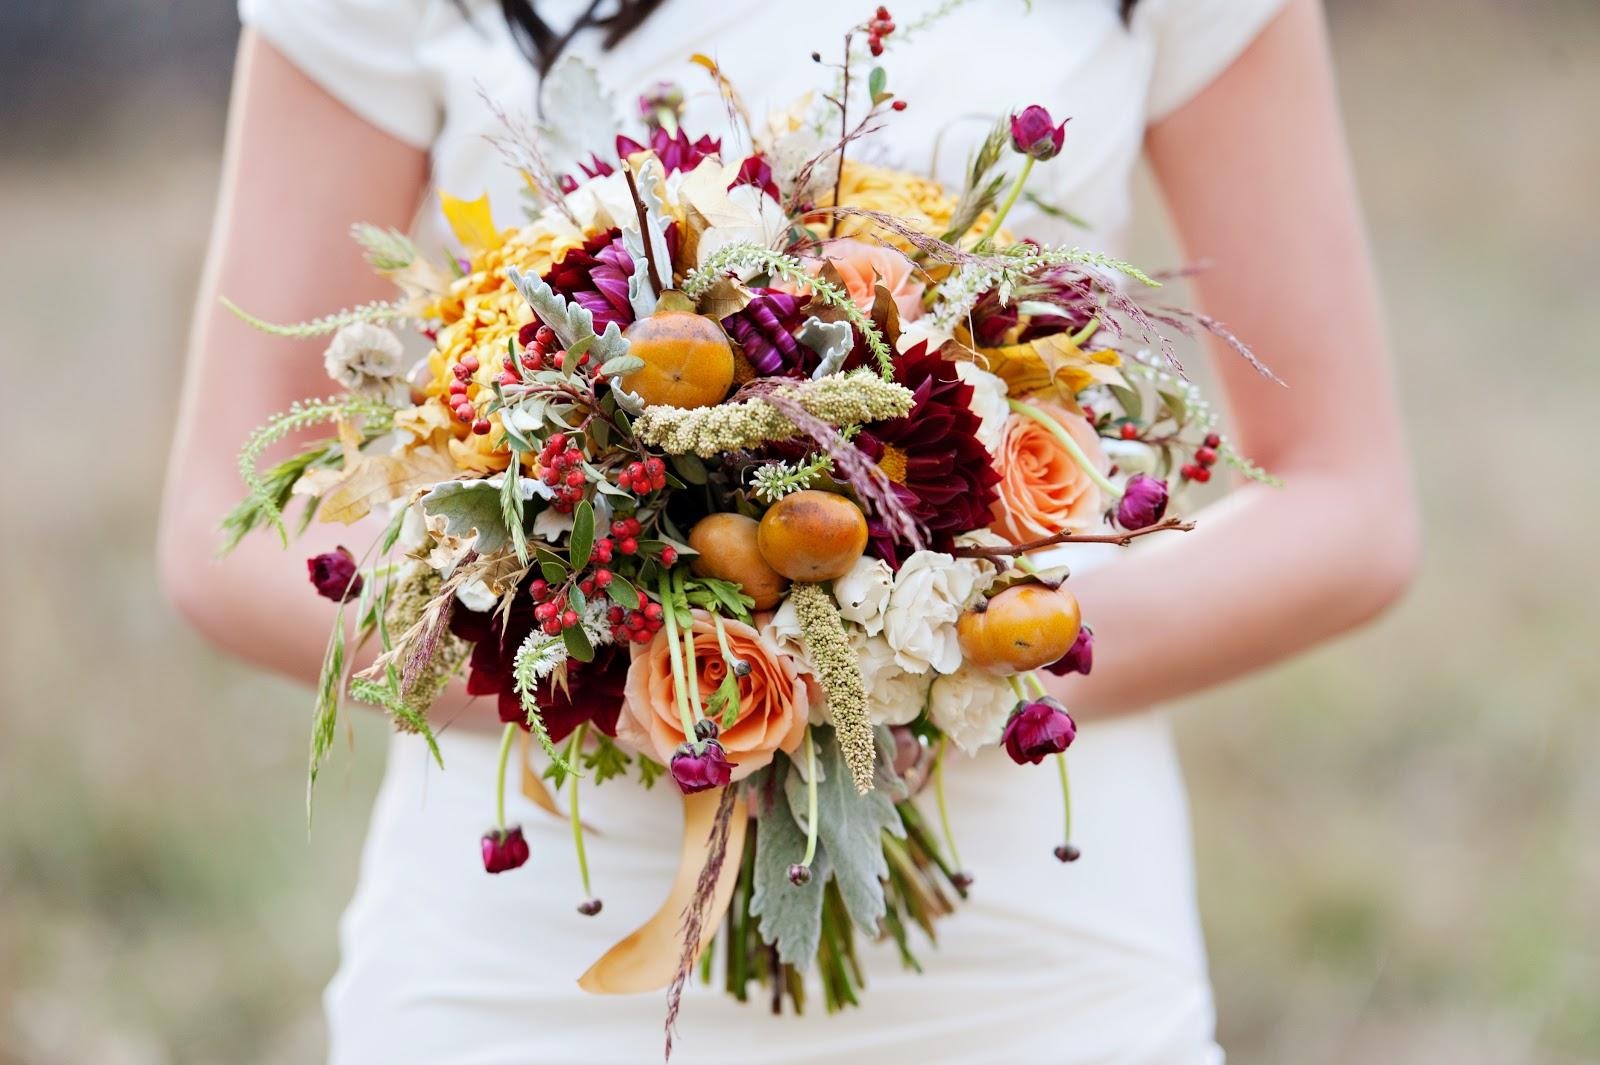 branches event floral company warmer times utah wedding florist. Black Bedroom Furniture Sets. Home Design Ideas